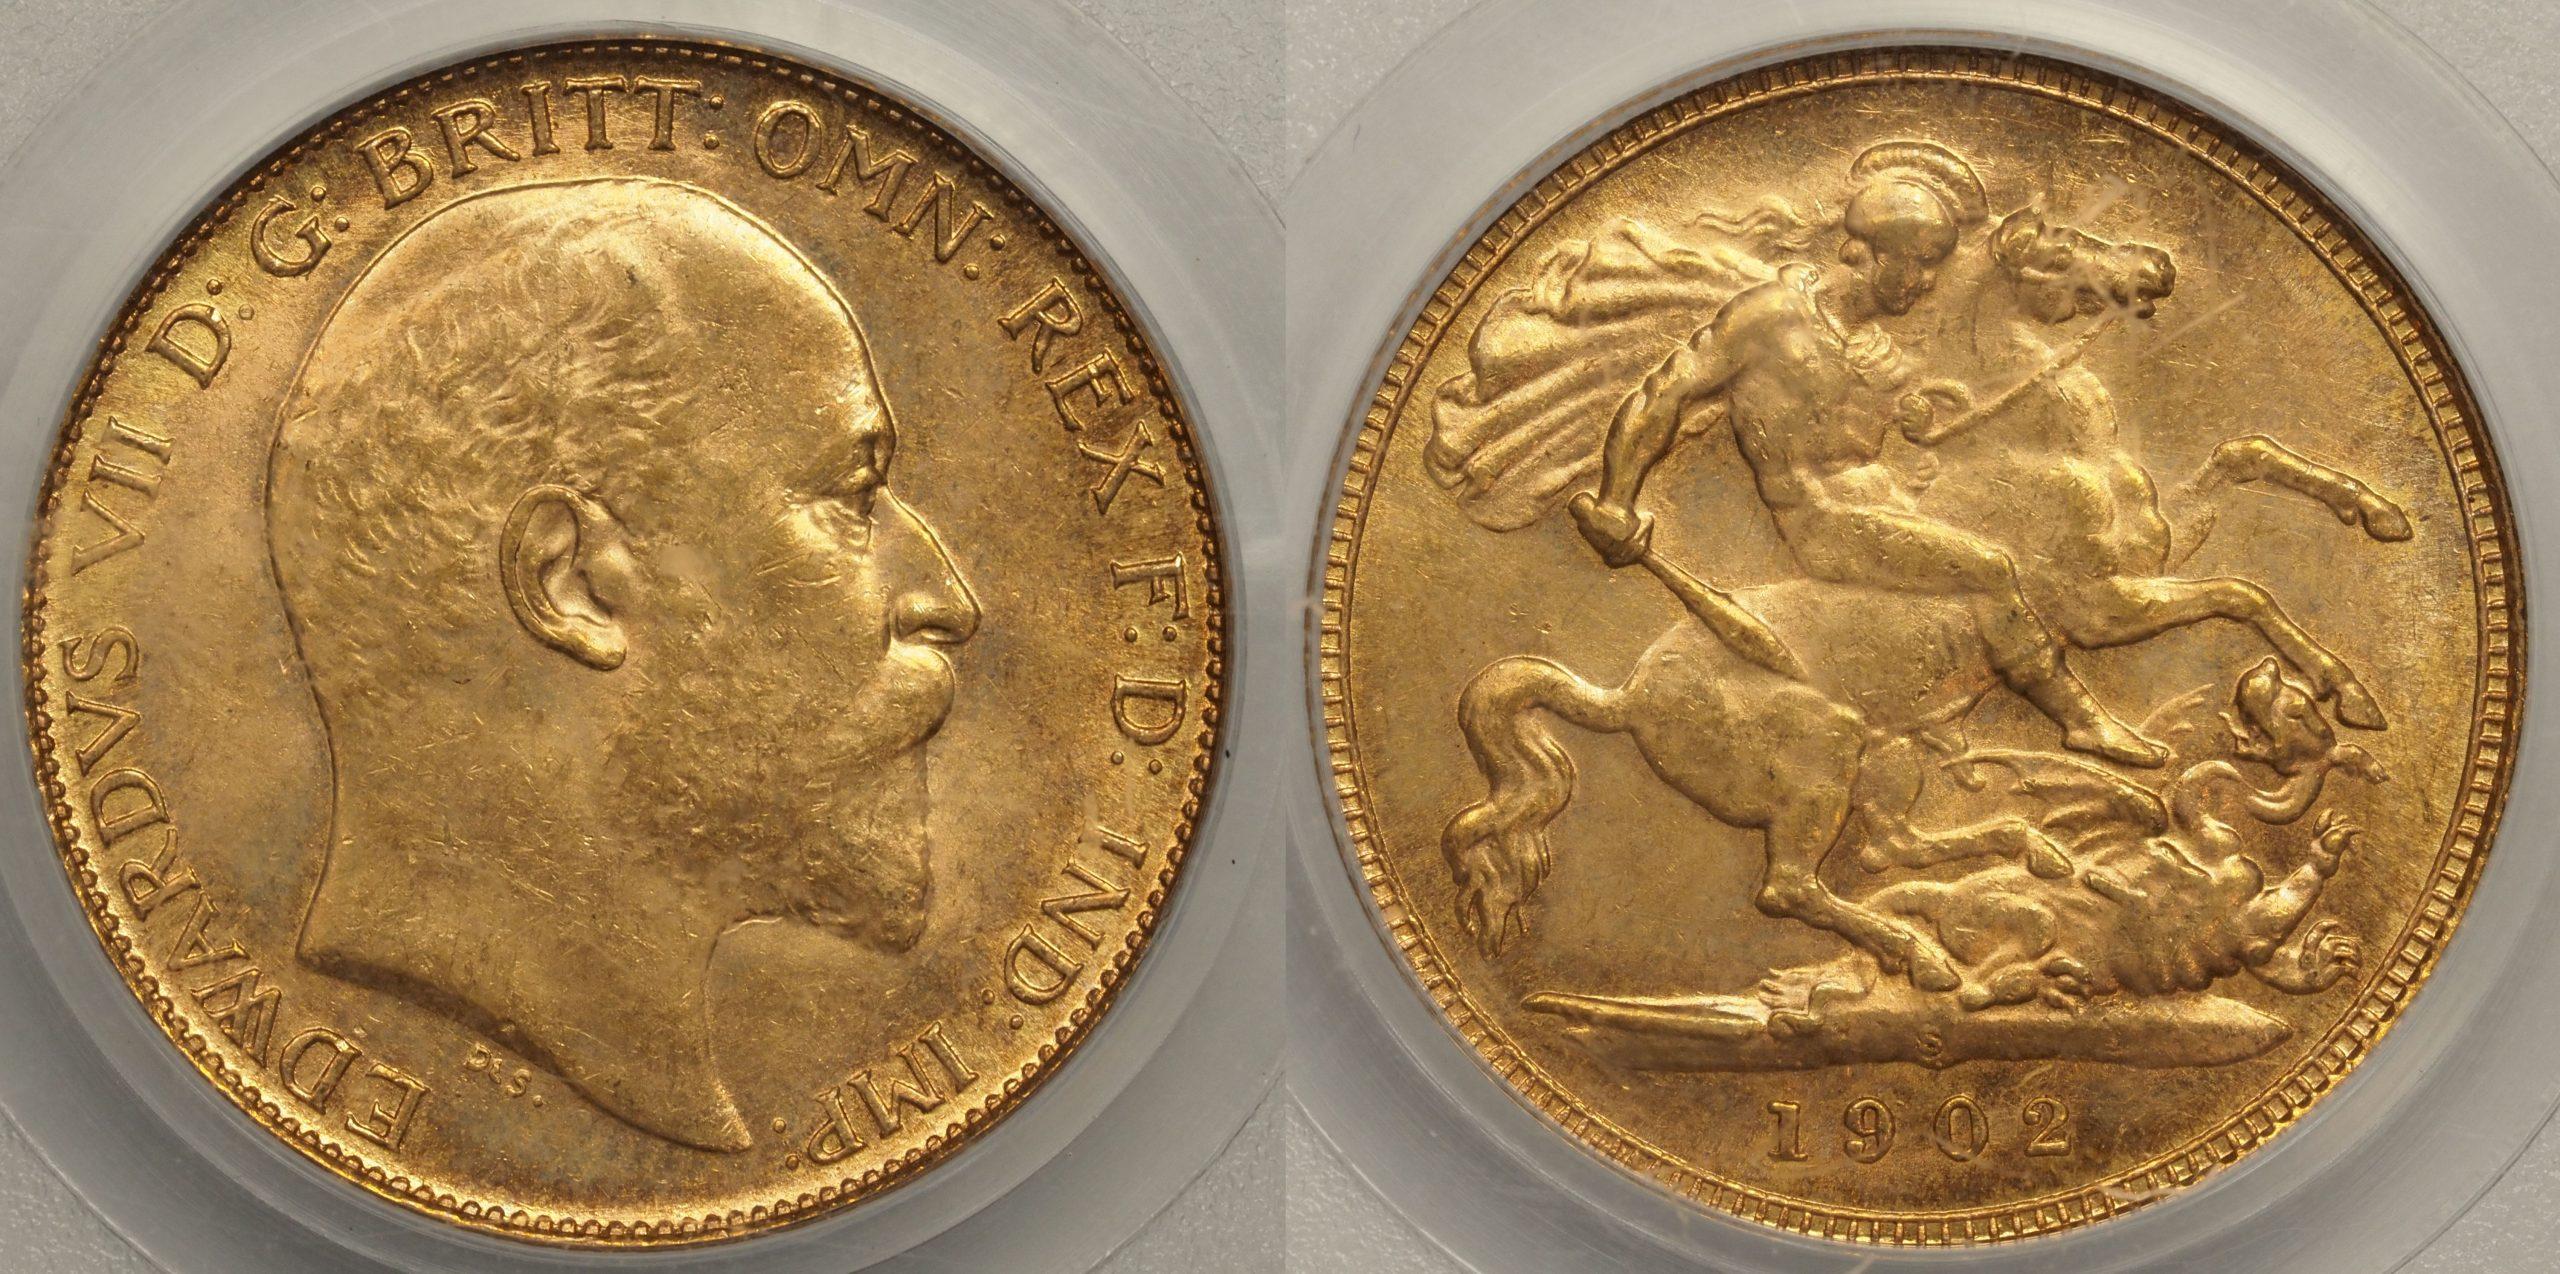 Australia 1902 Sydney Half Sovereign - PCGS MS62